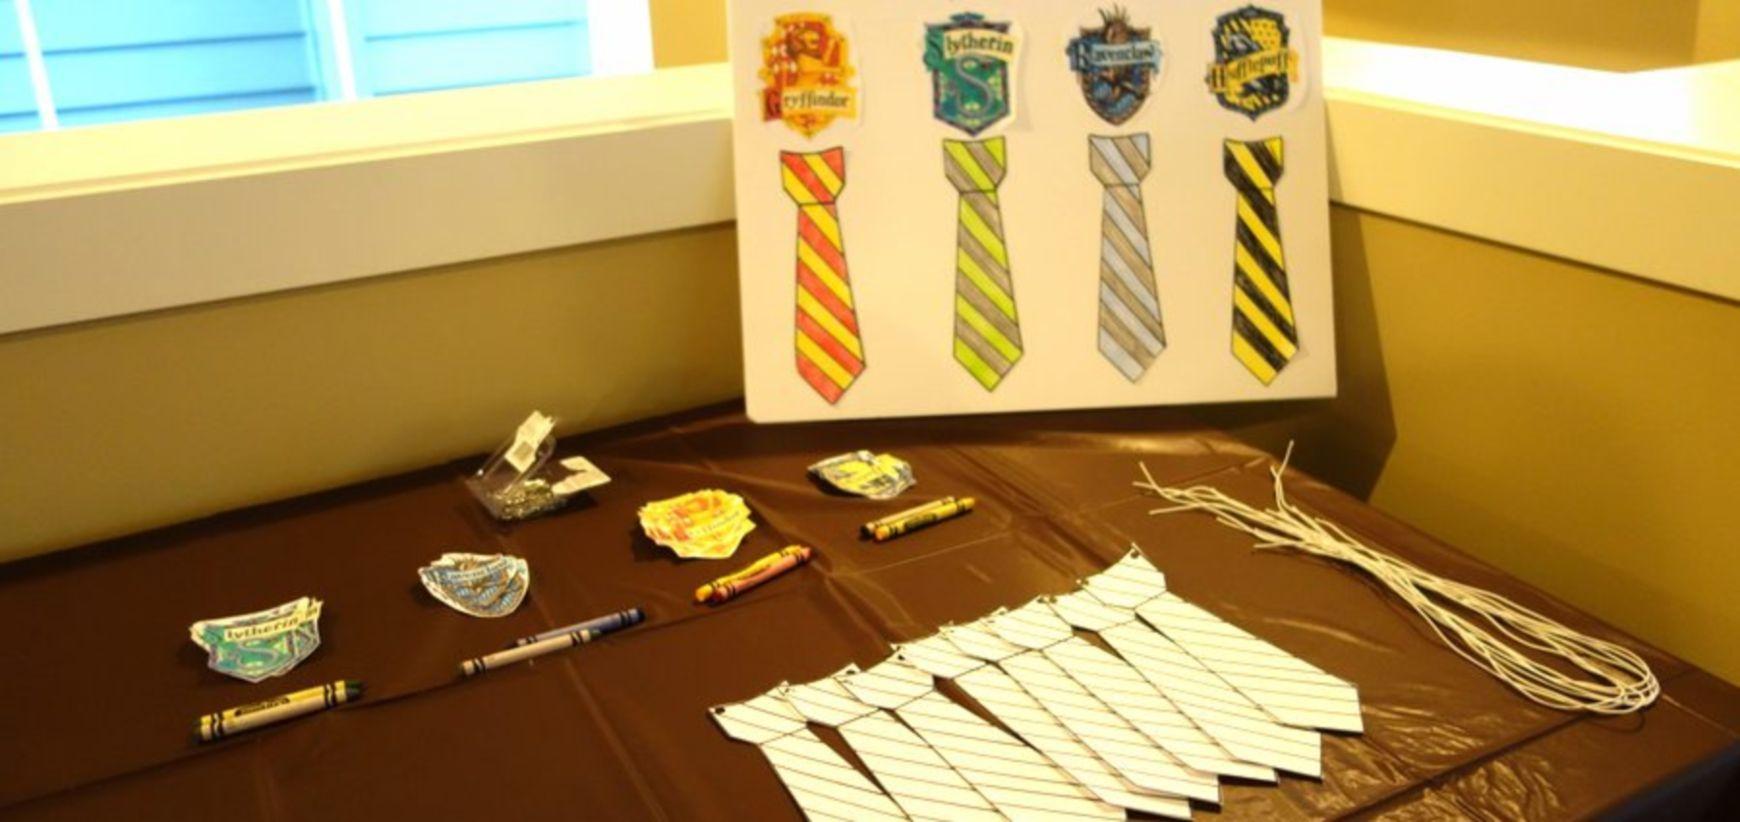 33 Outstanding DIY Harry Potter Party Ideas for Halloween - Decorhead.com